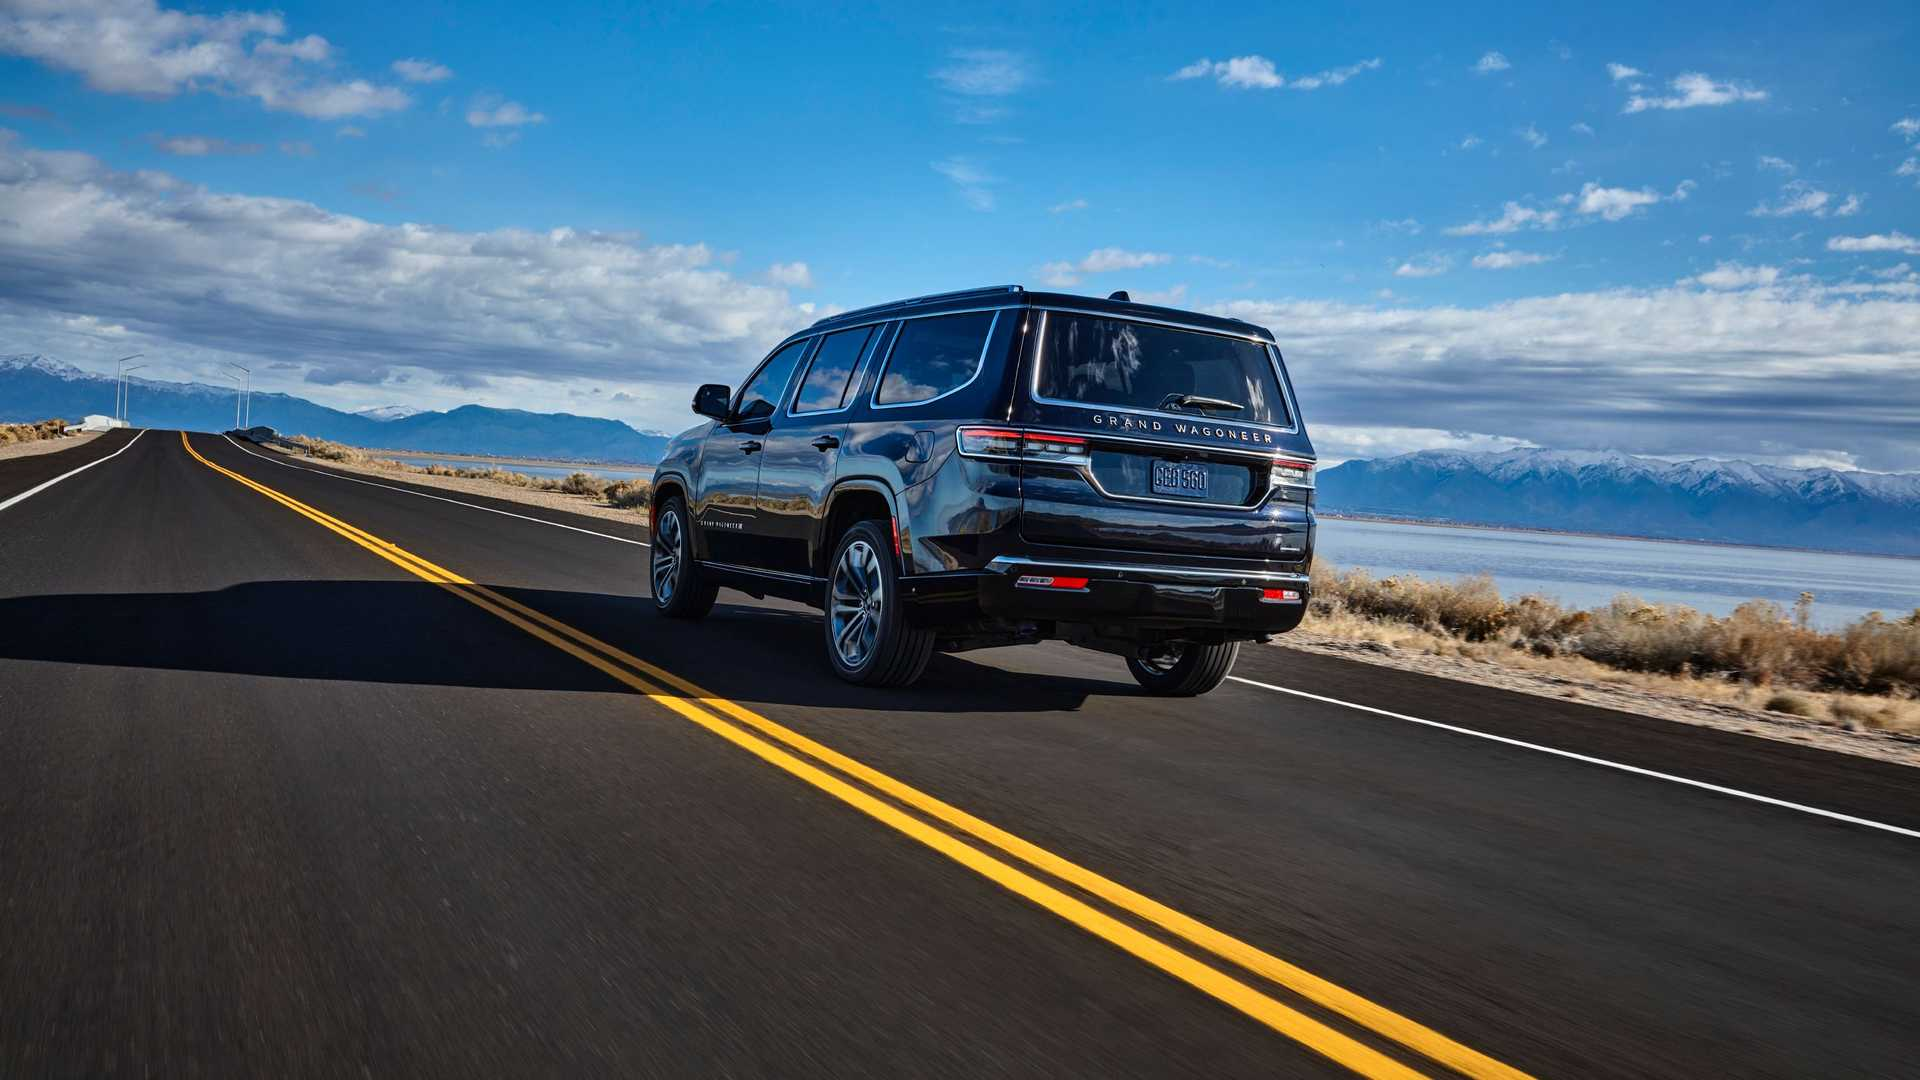 2022-jeep-grand-wagoneer-exterior-rear-quarter-6